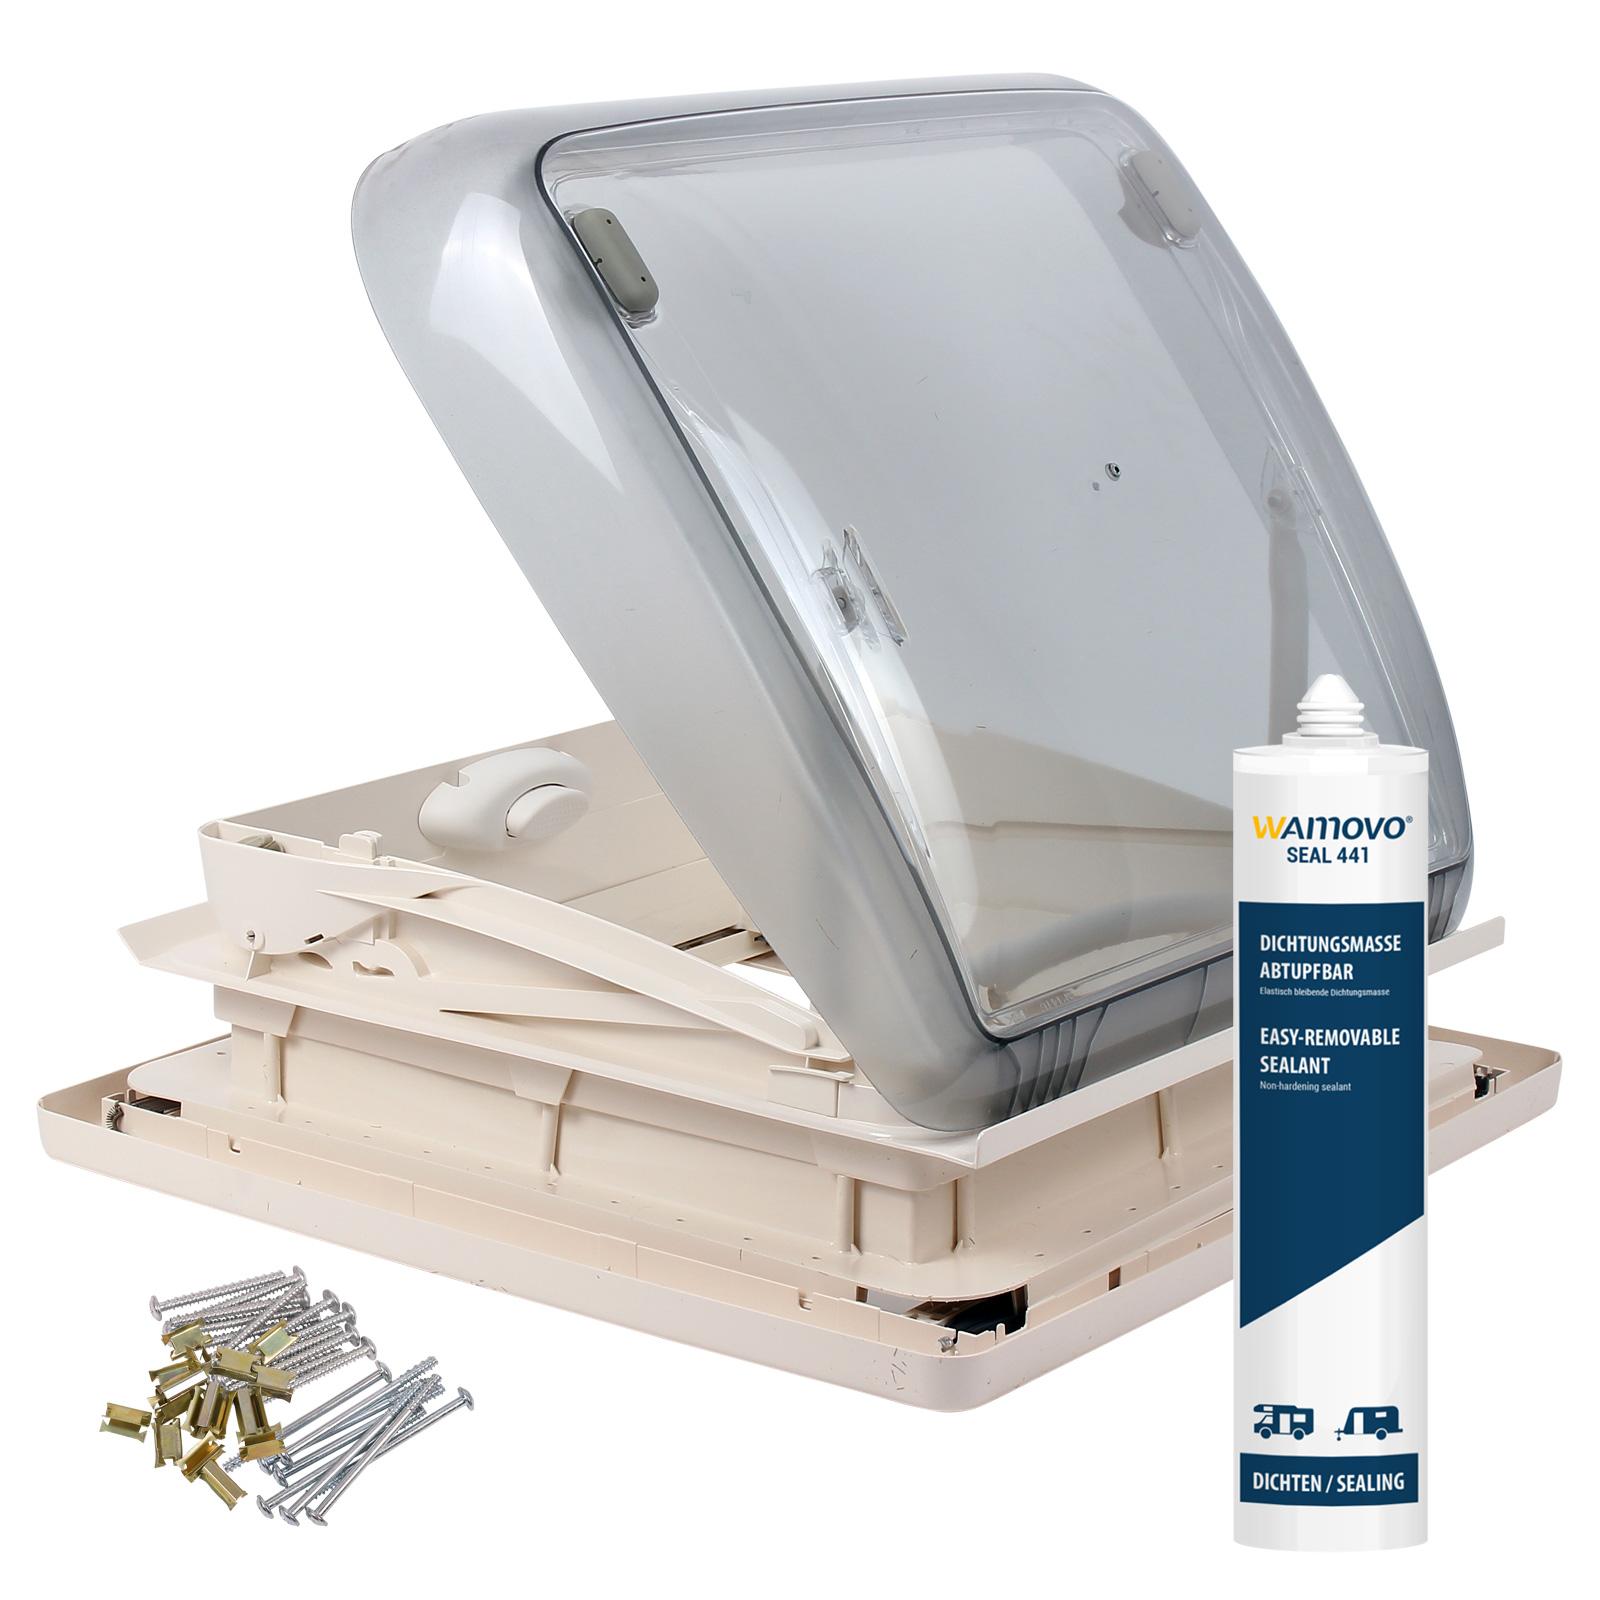 Dometic Mini Heki 40 x 40 Dachstärke 25 - 45 mm Zwangsbelüftung + Dichtmittel